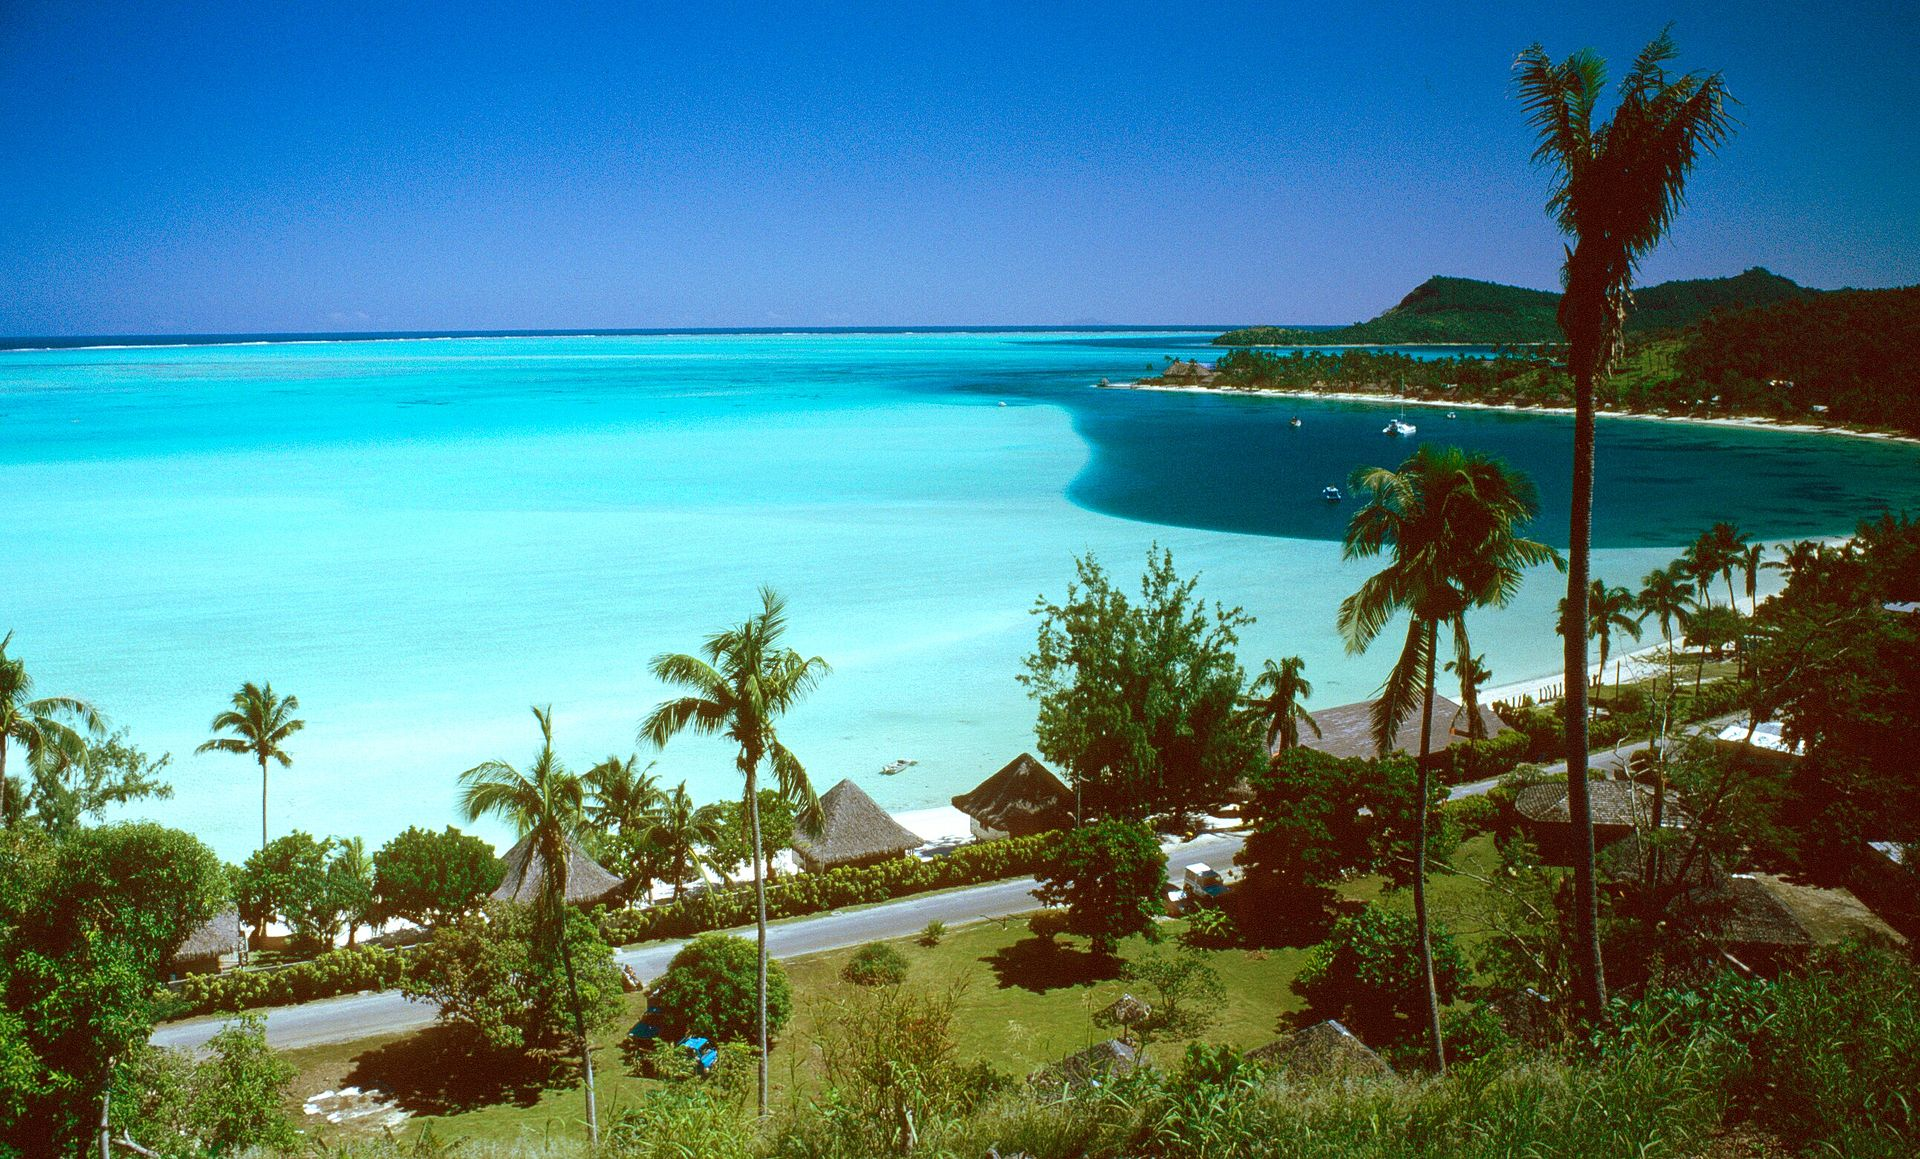 The Pacific S Best Islands And Beaches: Wikipedia, La Enciclopedia Libre